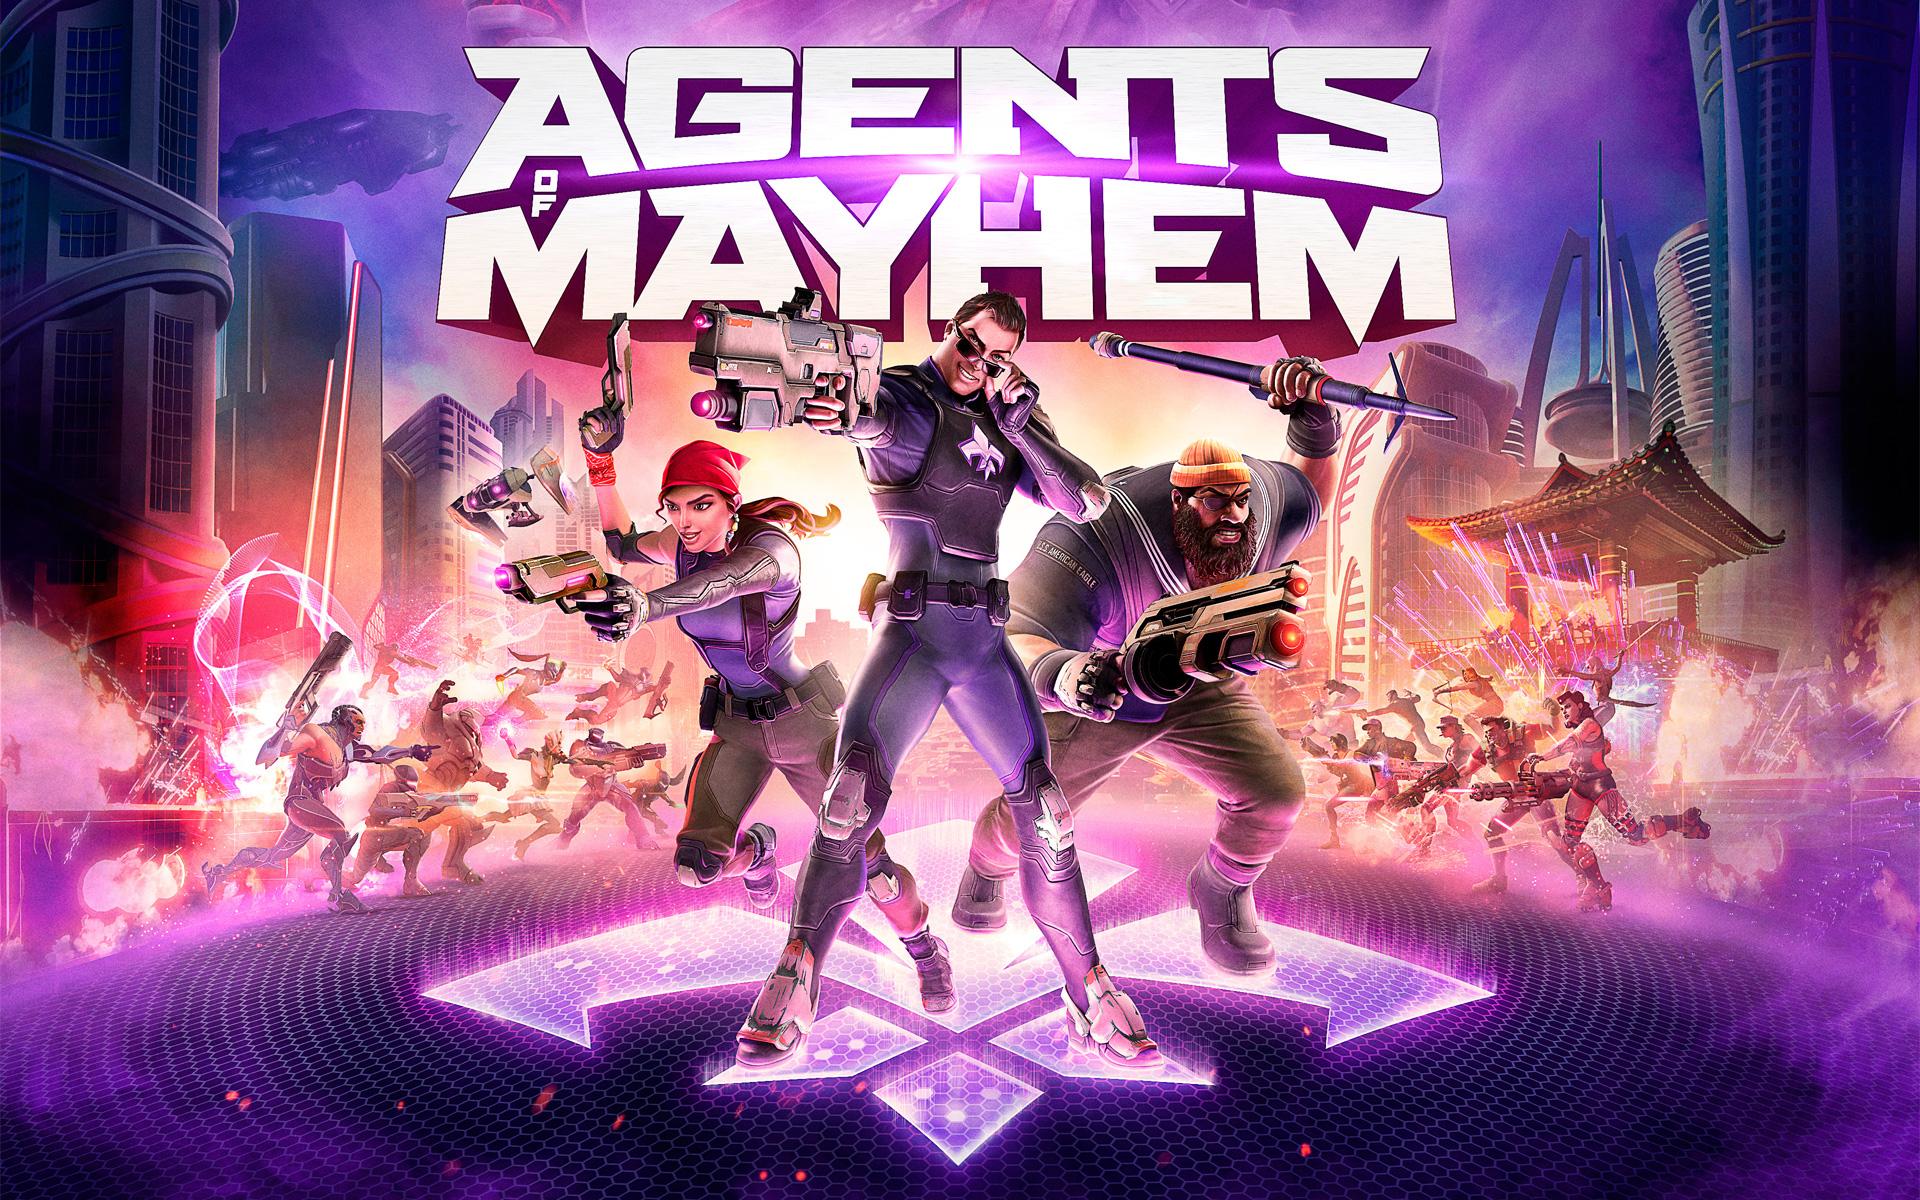 Free Agents of Mayhem Wallpaper in 1920x1200